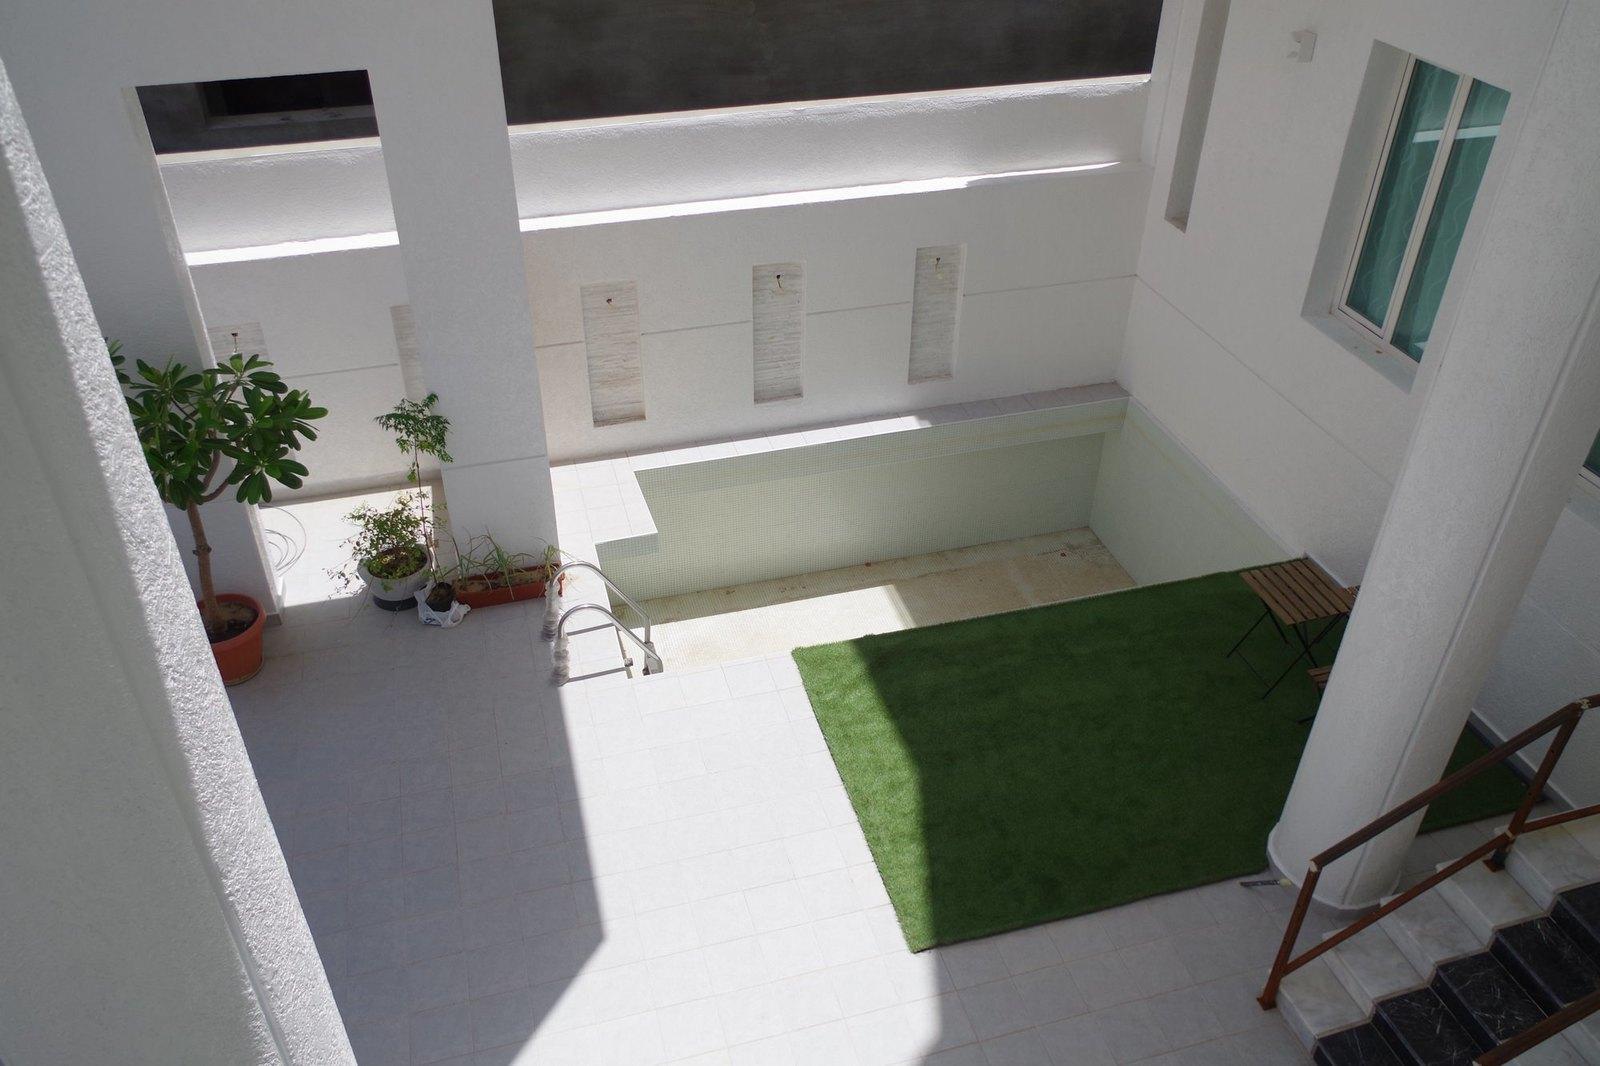 Jaber Al Ahmad – unfurnished, 5 bedroom villa w/basement and pool